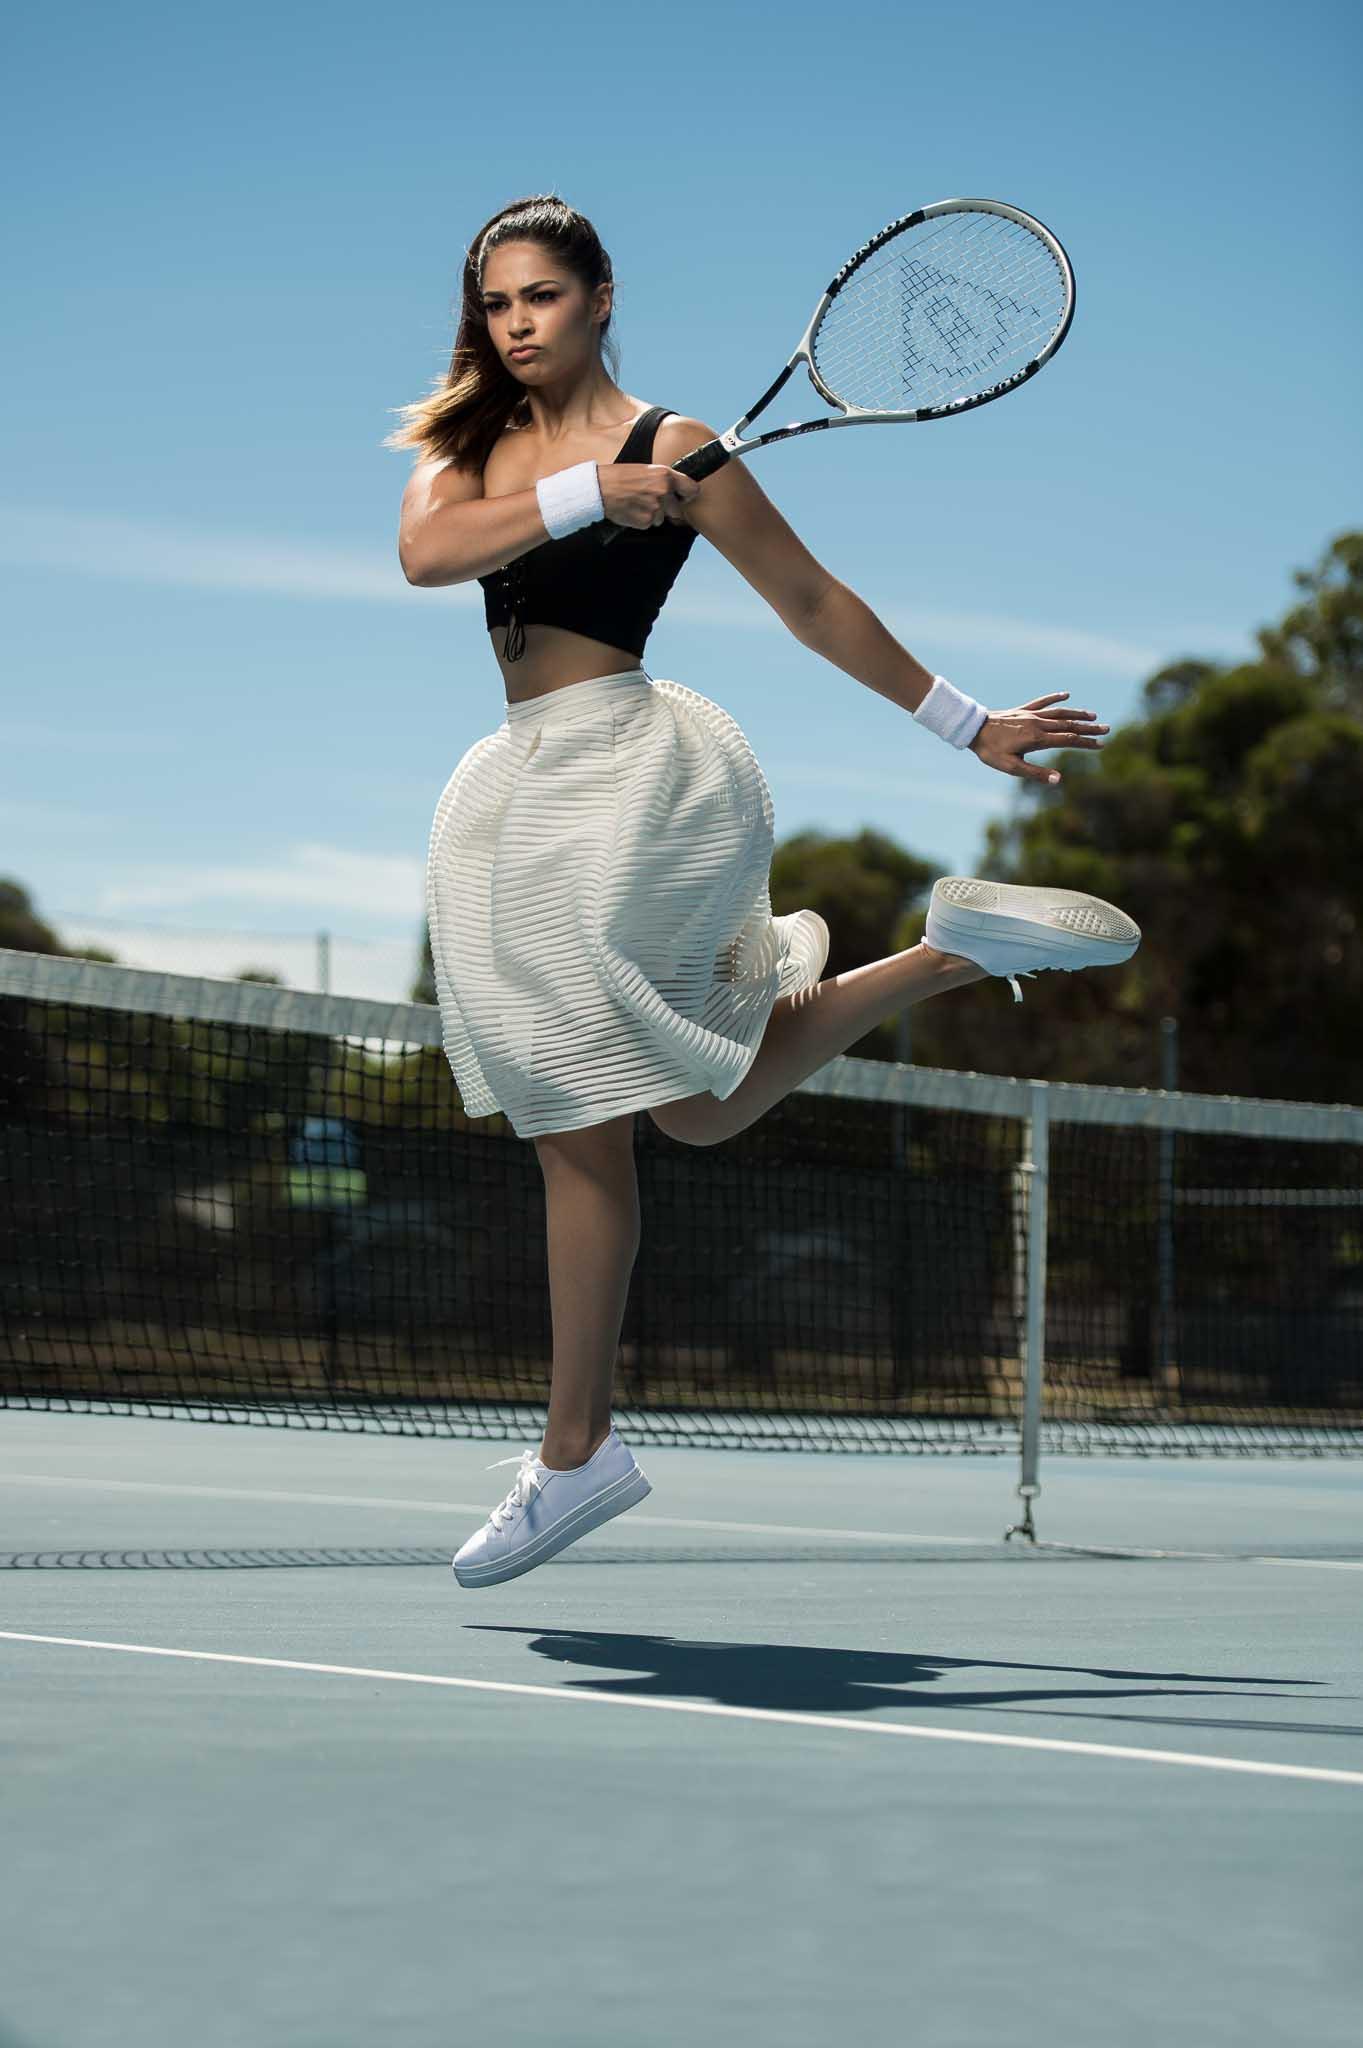 Karina Perths female fitness talent playing tennis